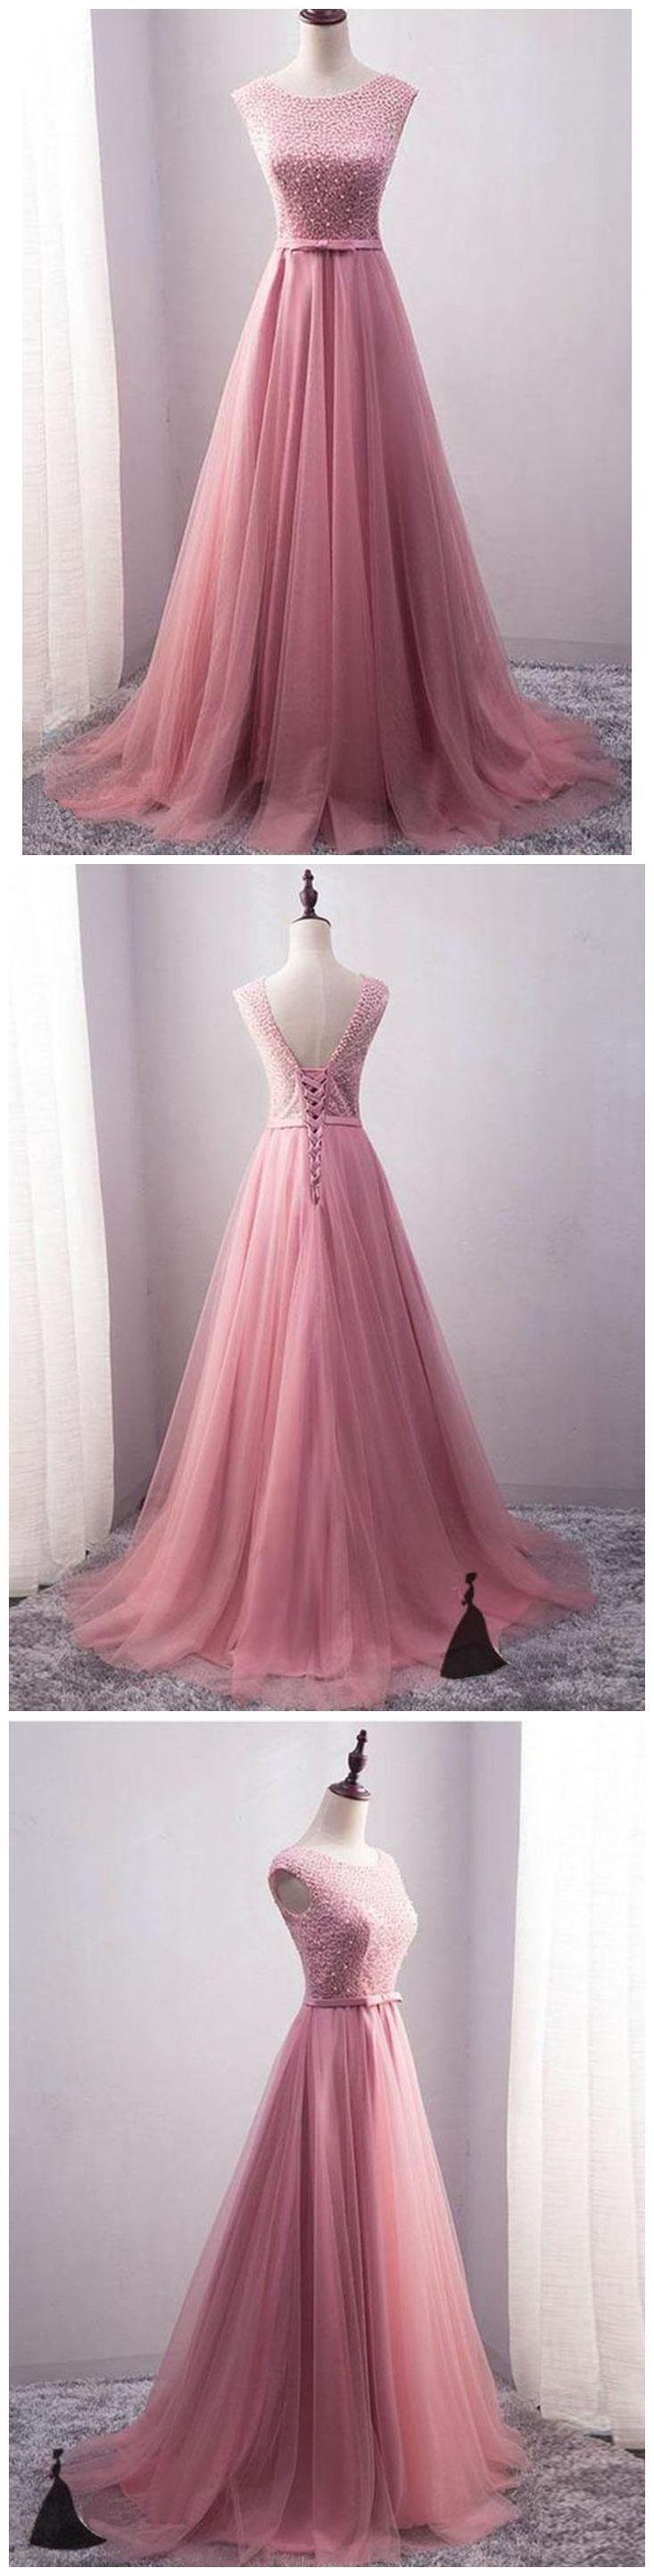 lace prom dress, 2018 prom dress, prom dresses 2019, prom